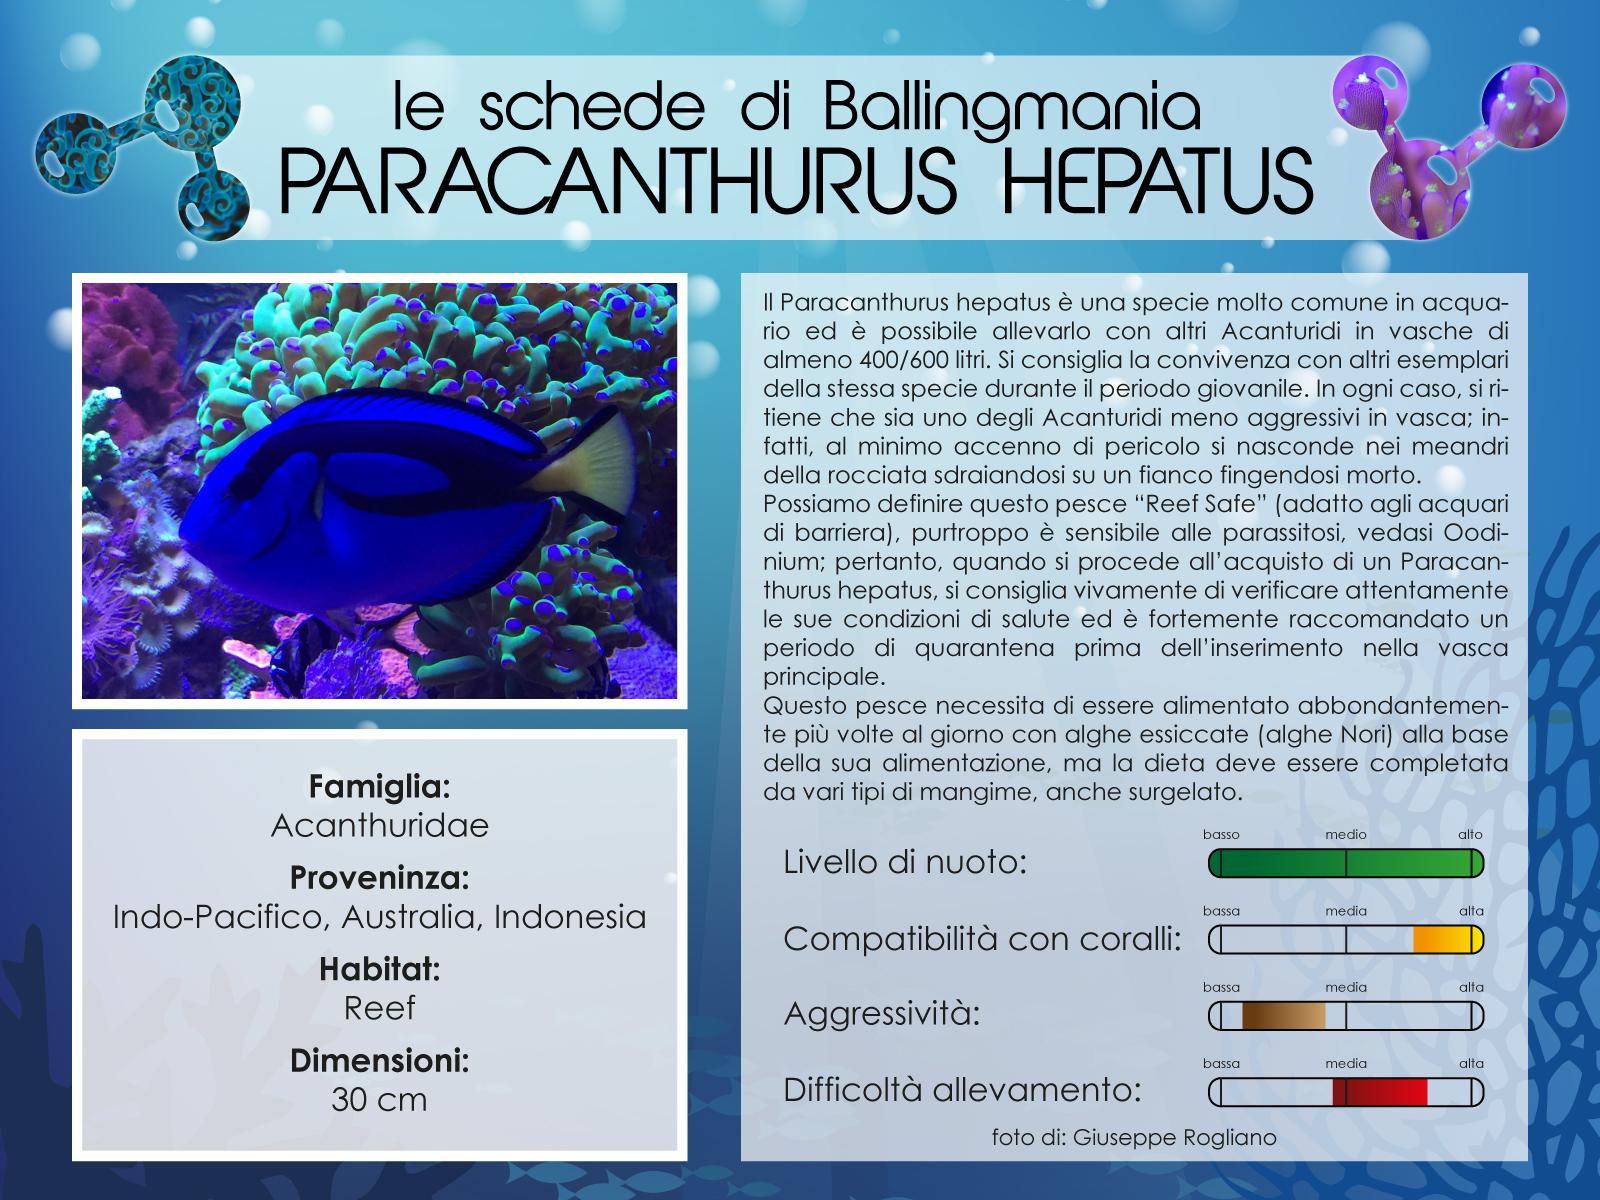 Paracanthurus Hepatus